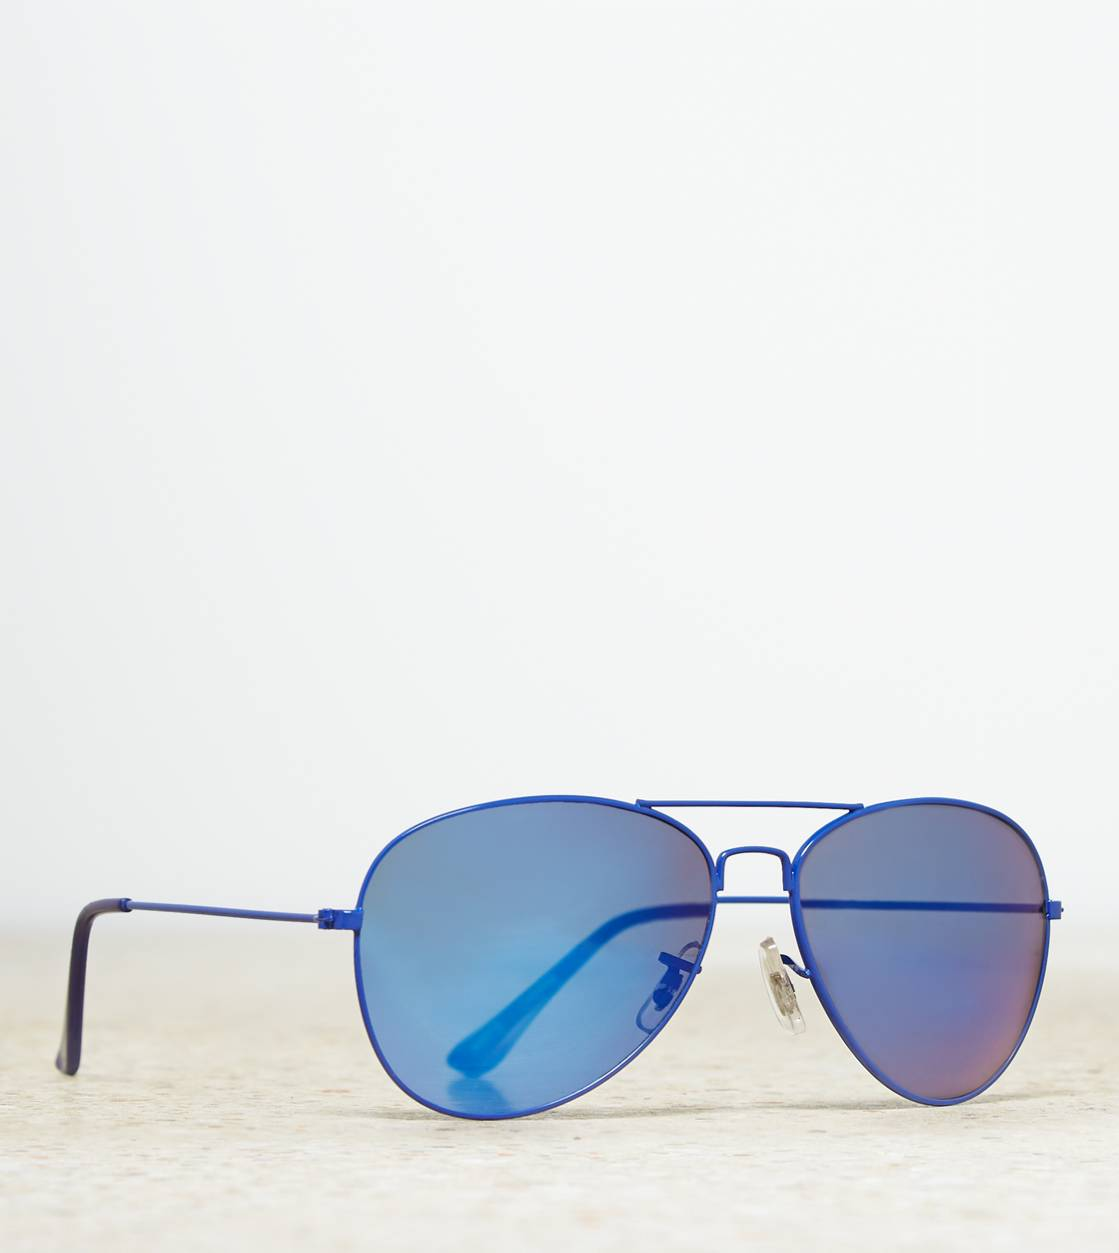 AEO Aviator Sunglasses, Blue | American Eagle Outfitters